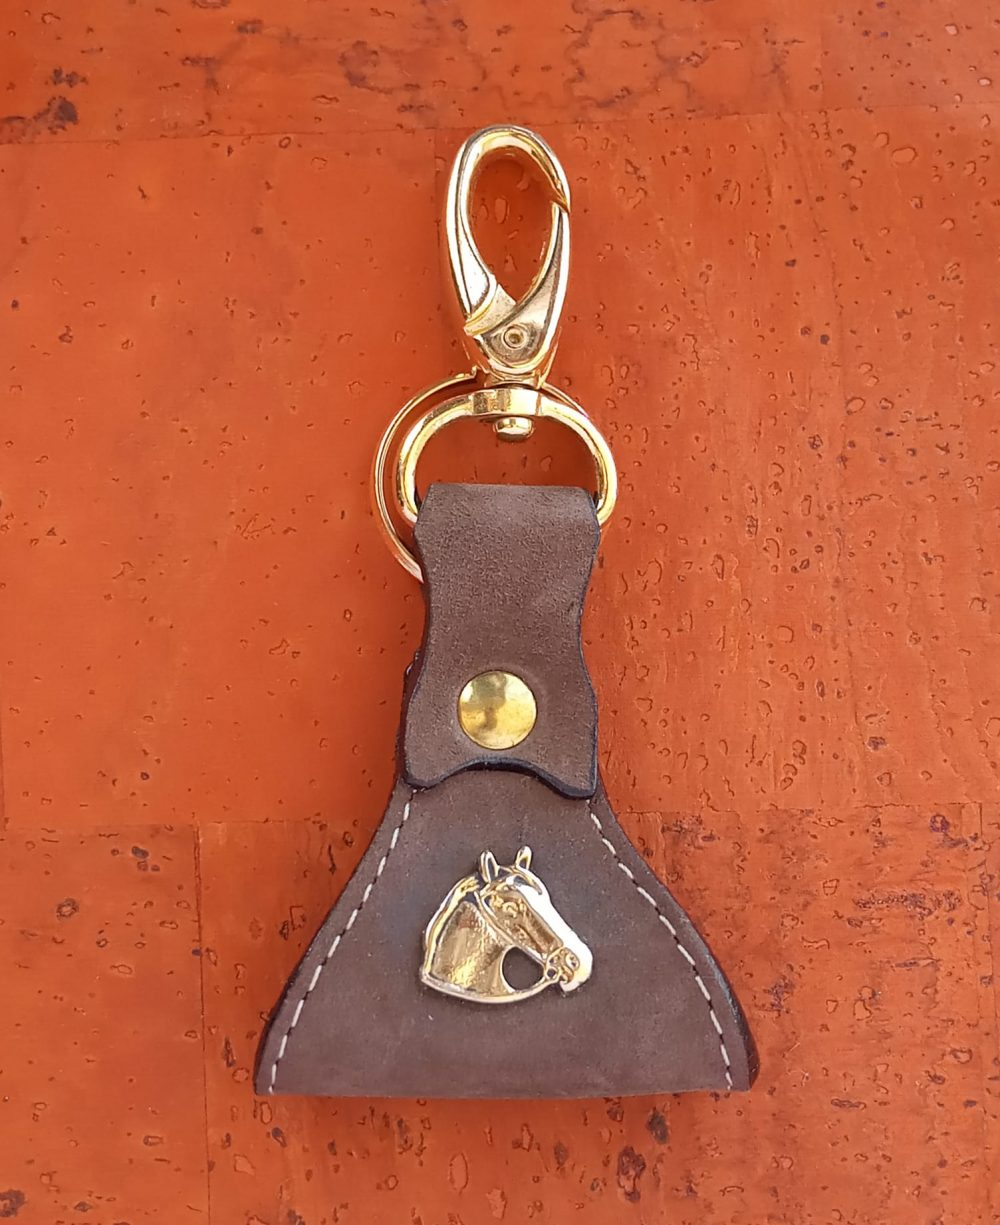 porta-chaves pele crute